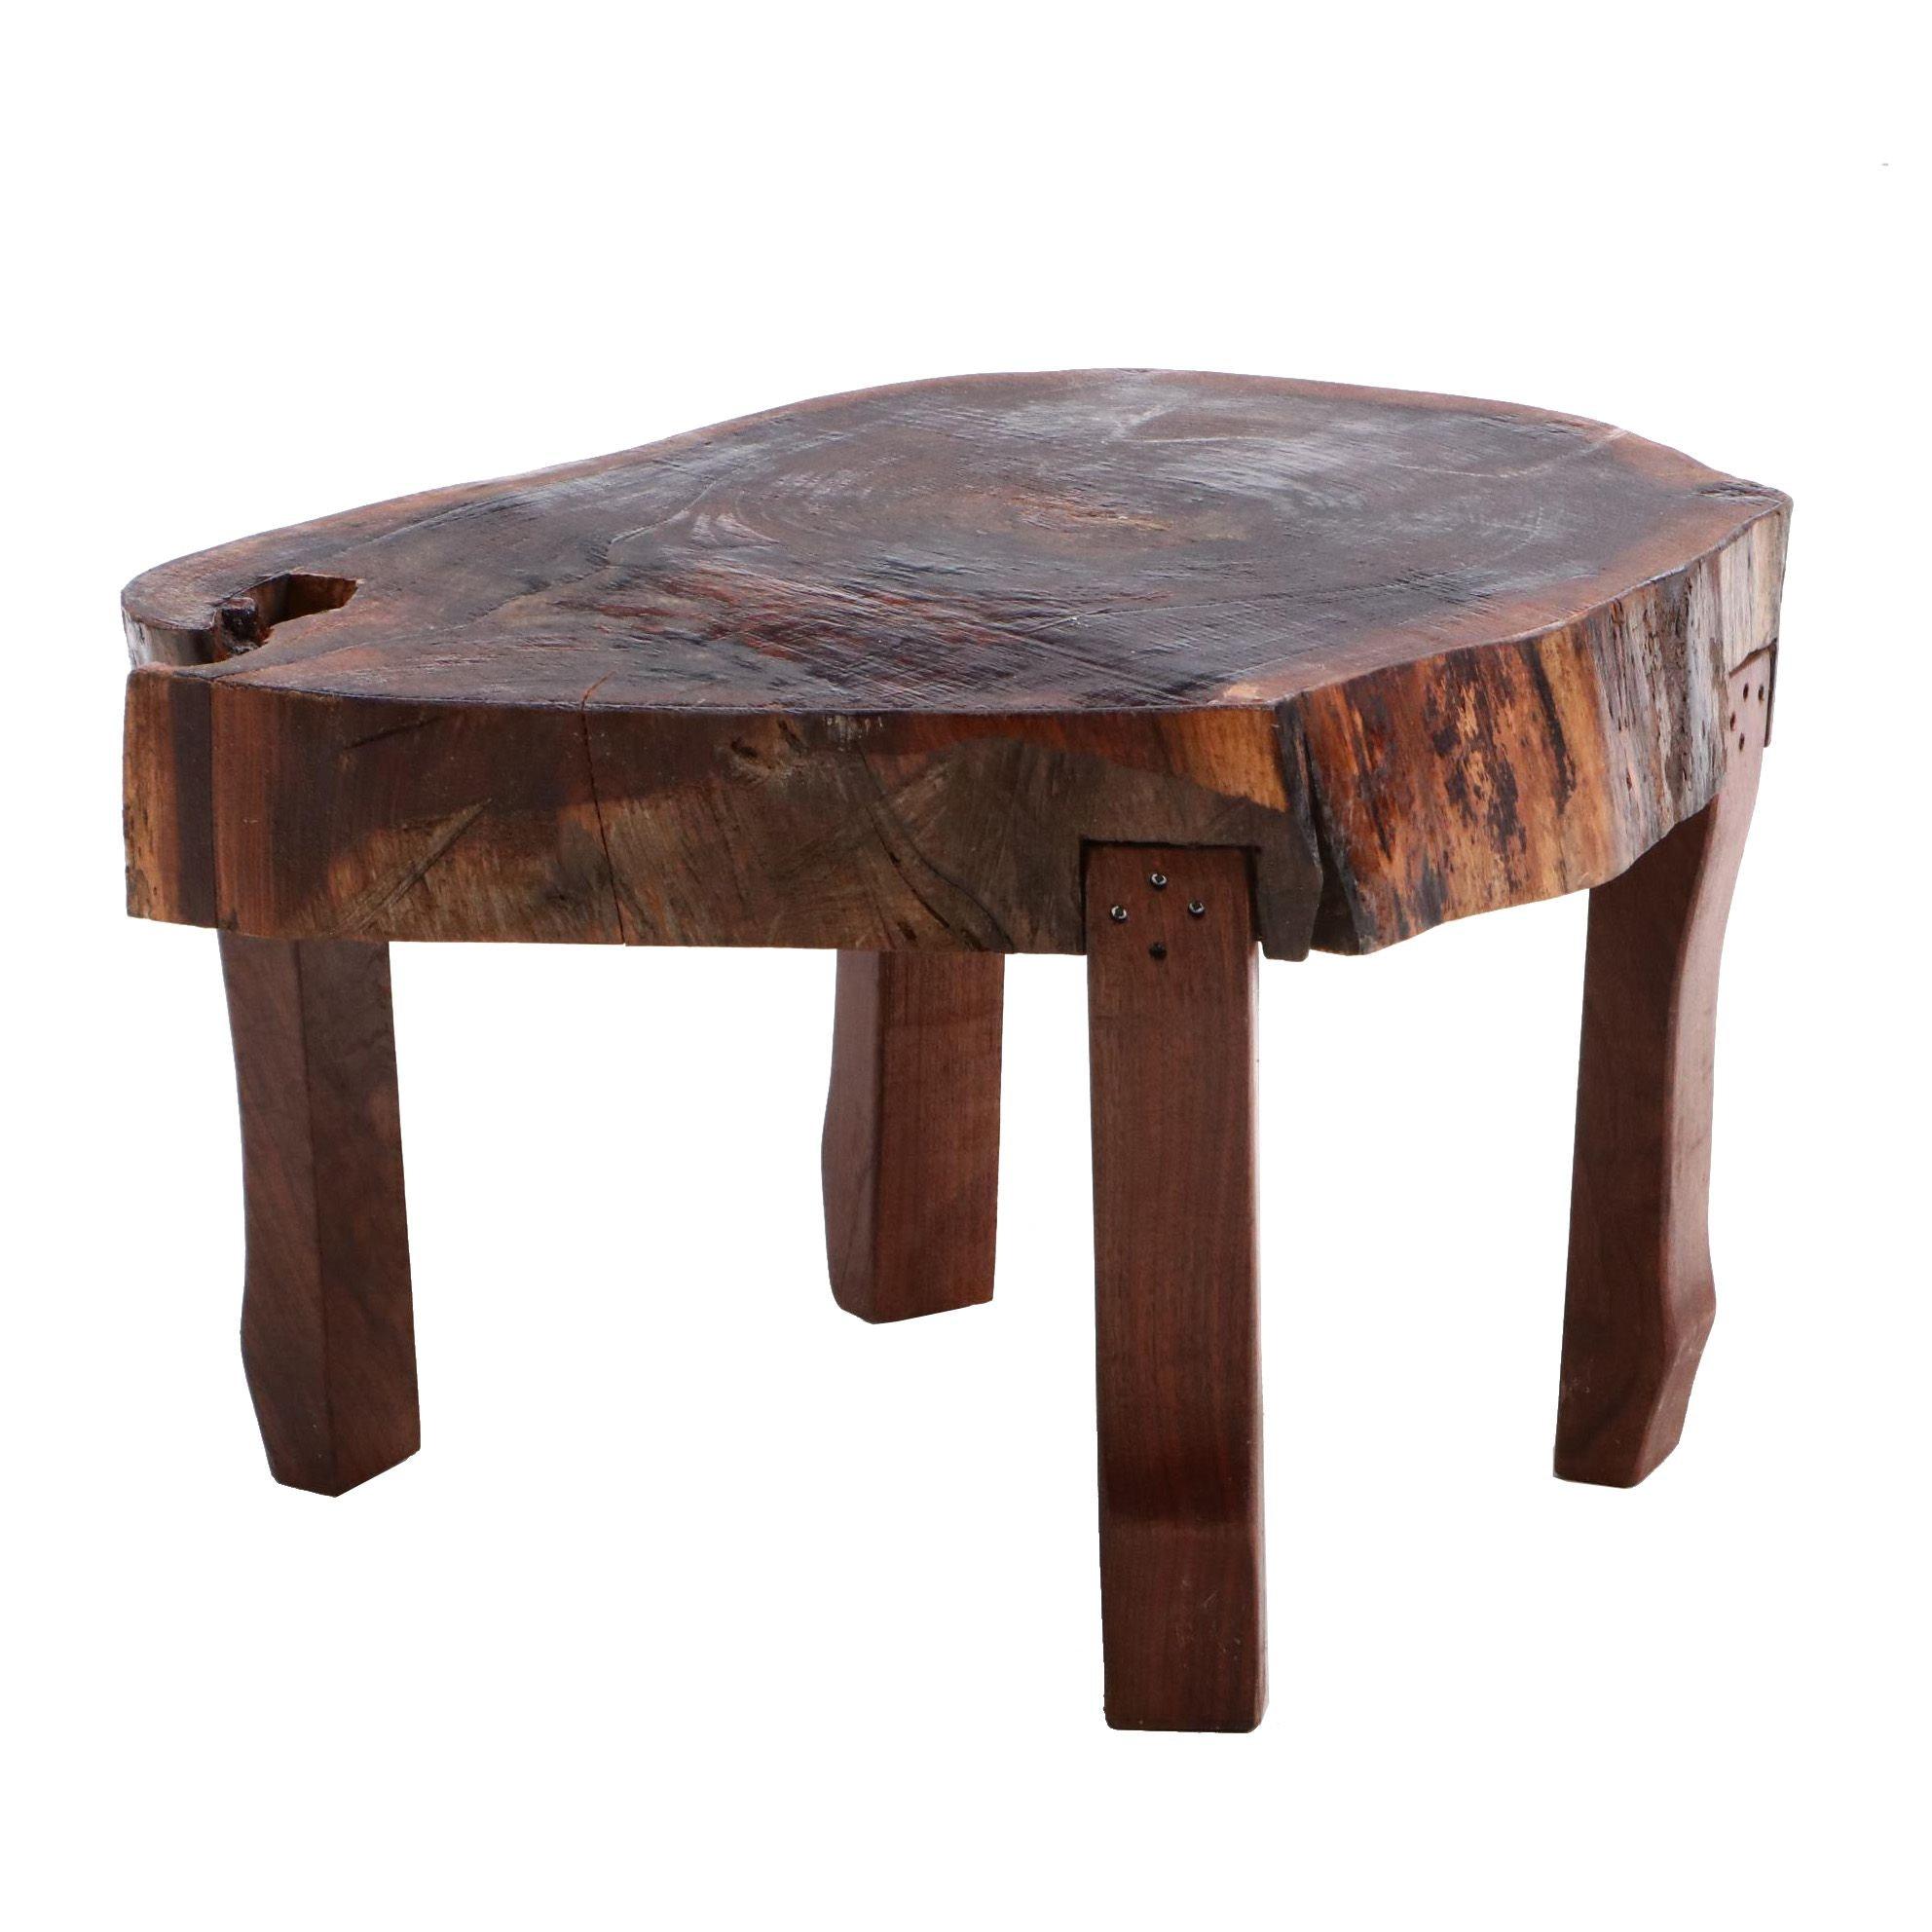 Benchmade Living Edge Walnut Coffee Table